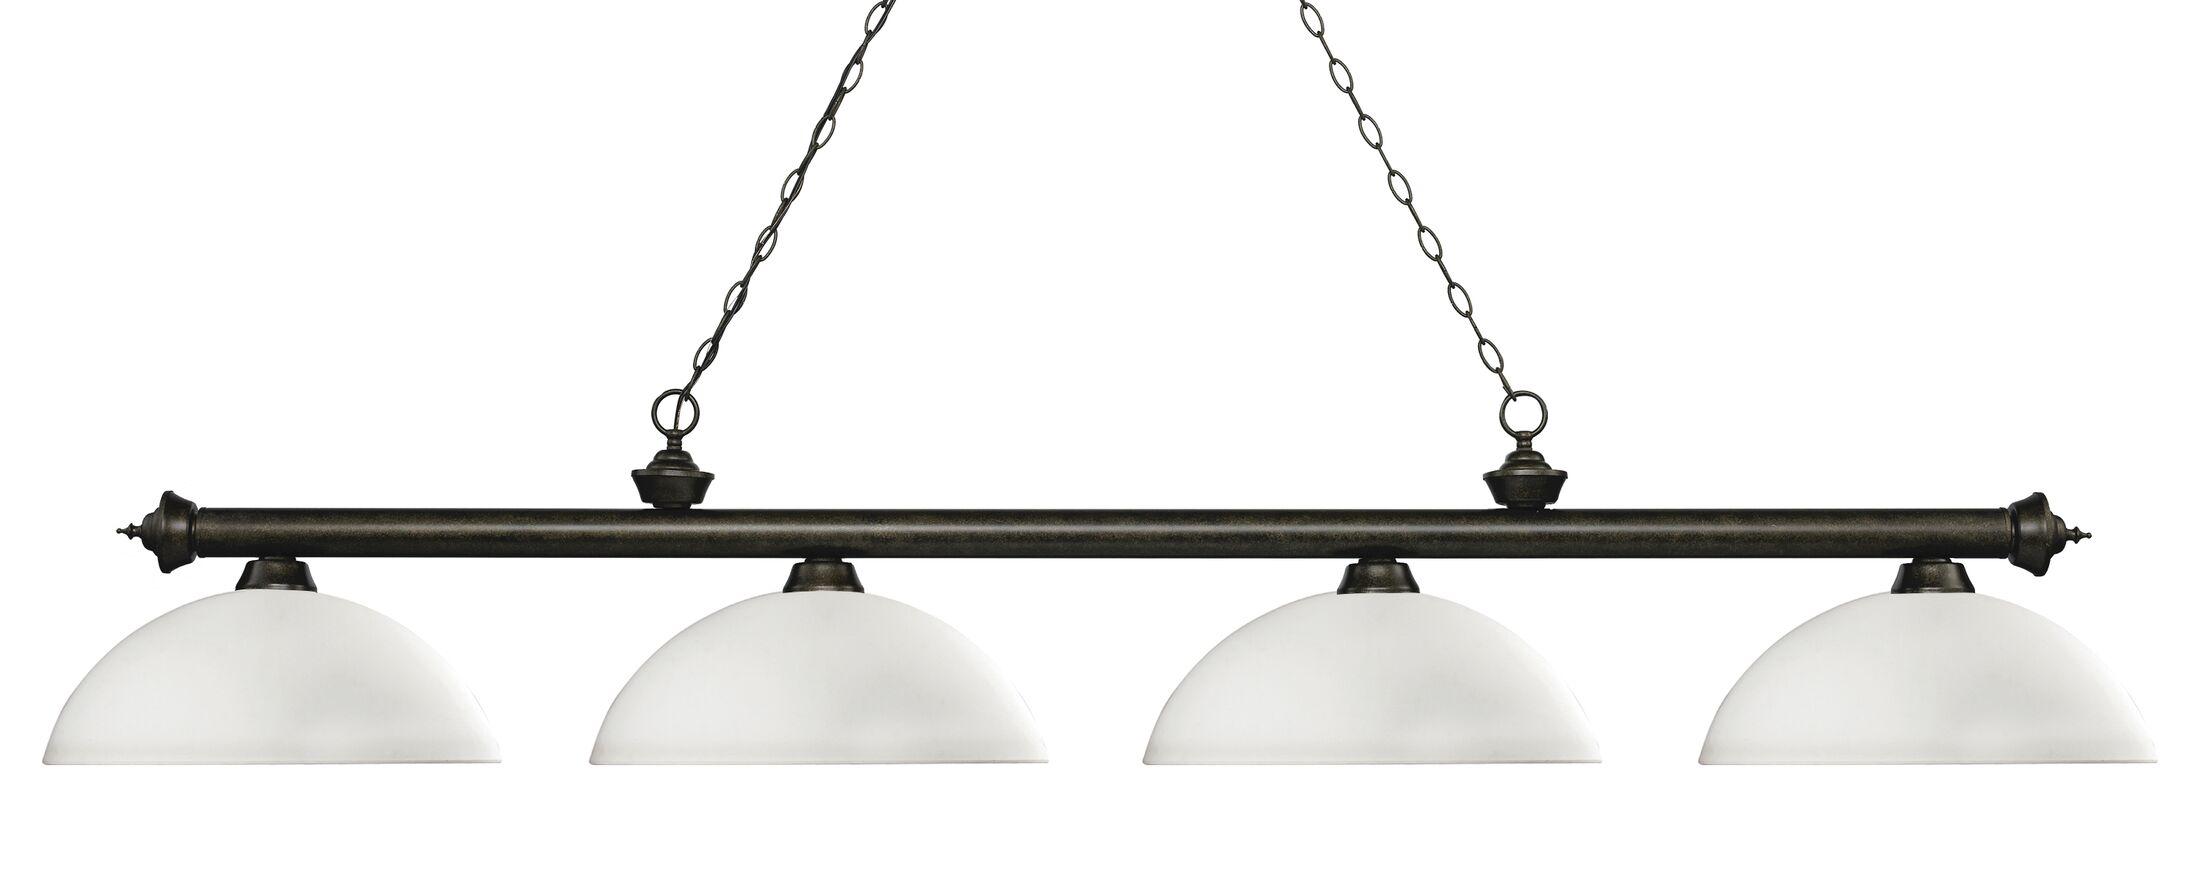 Zephyr 4-Light Bowl Shade Billiard Light Shade Color: Matte Opal, Finish: Golden Bronze